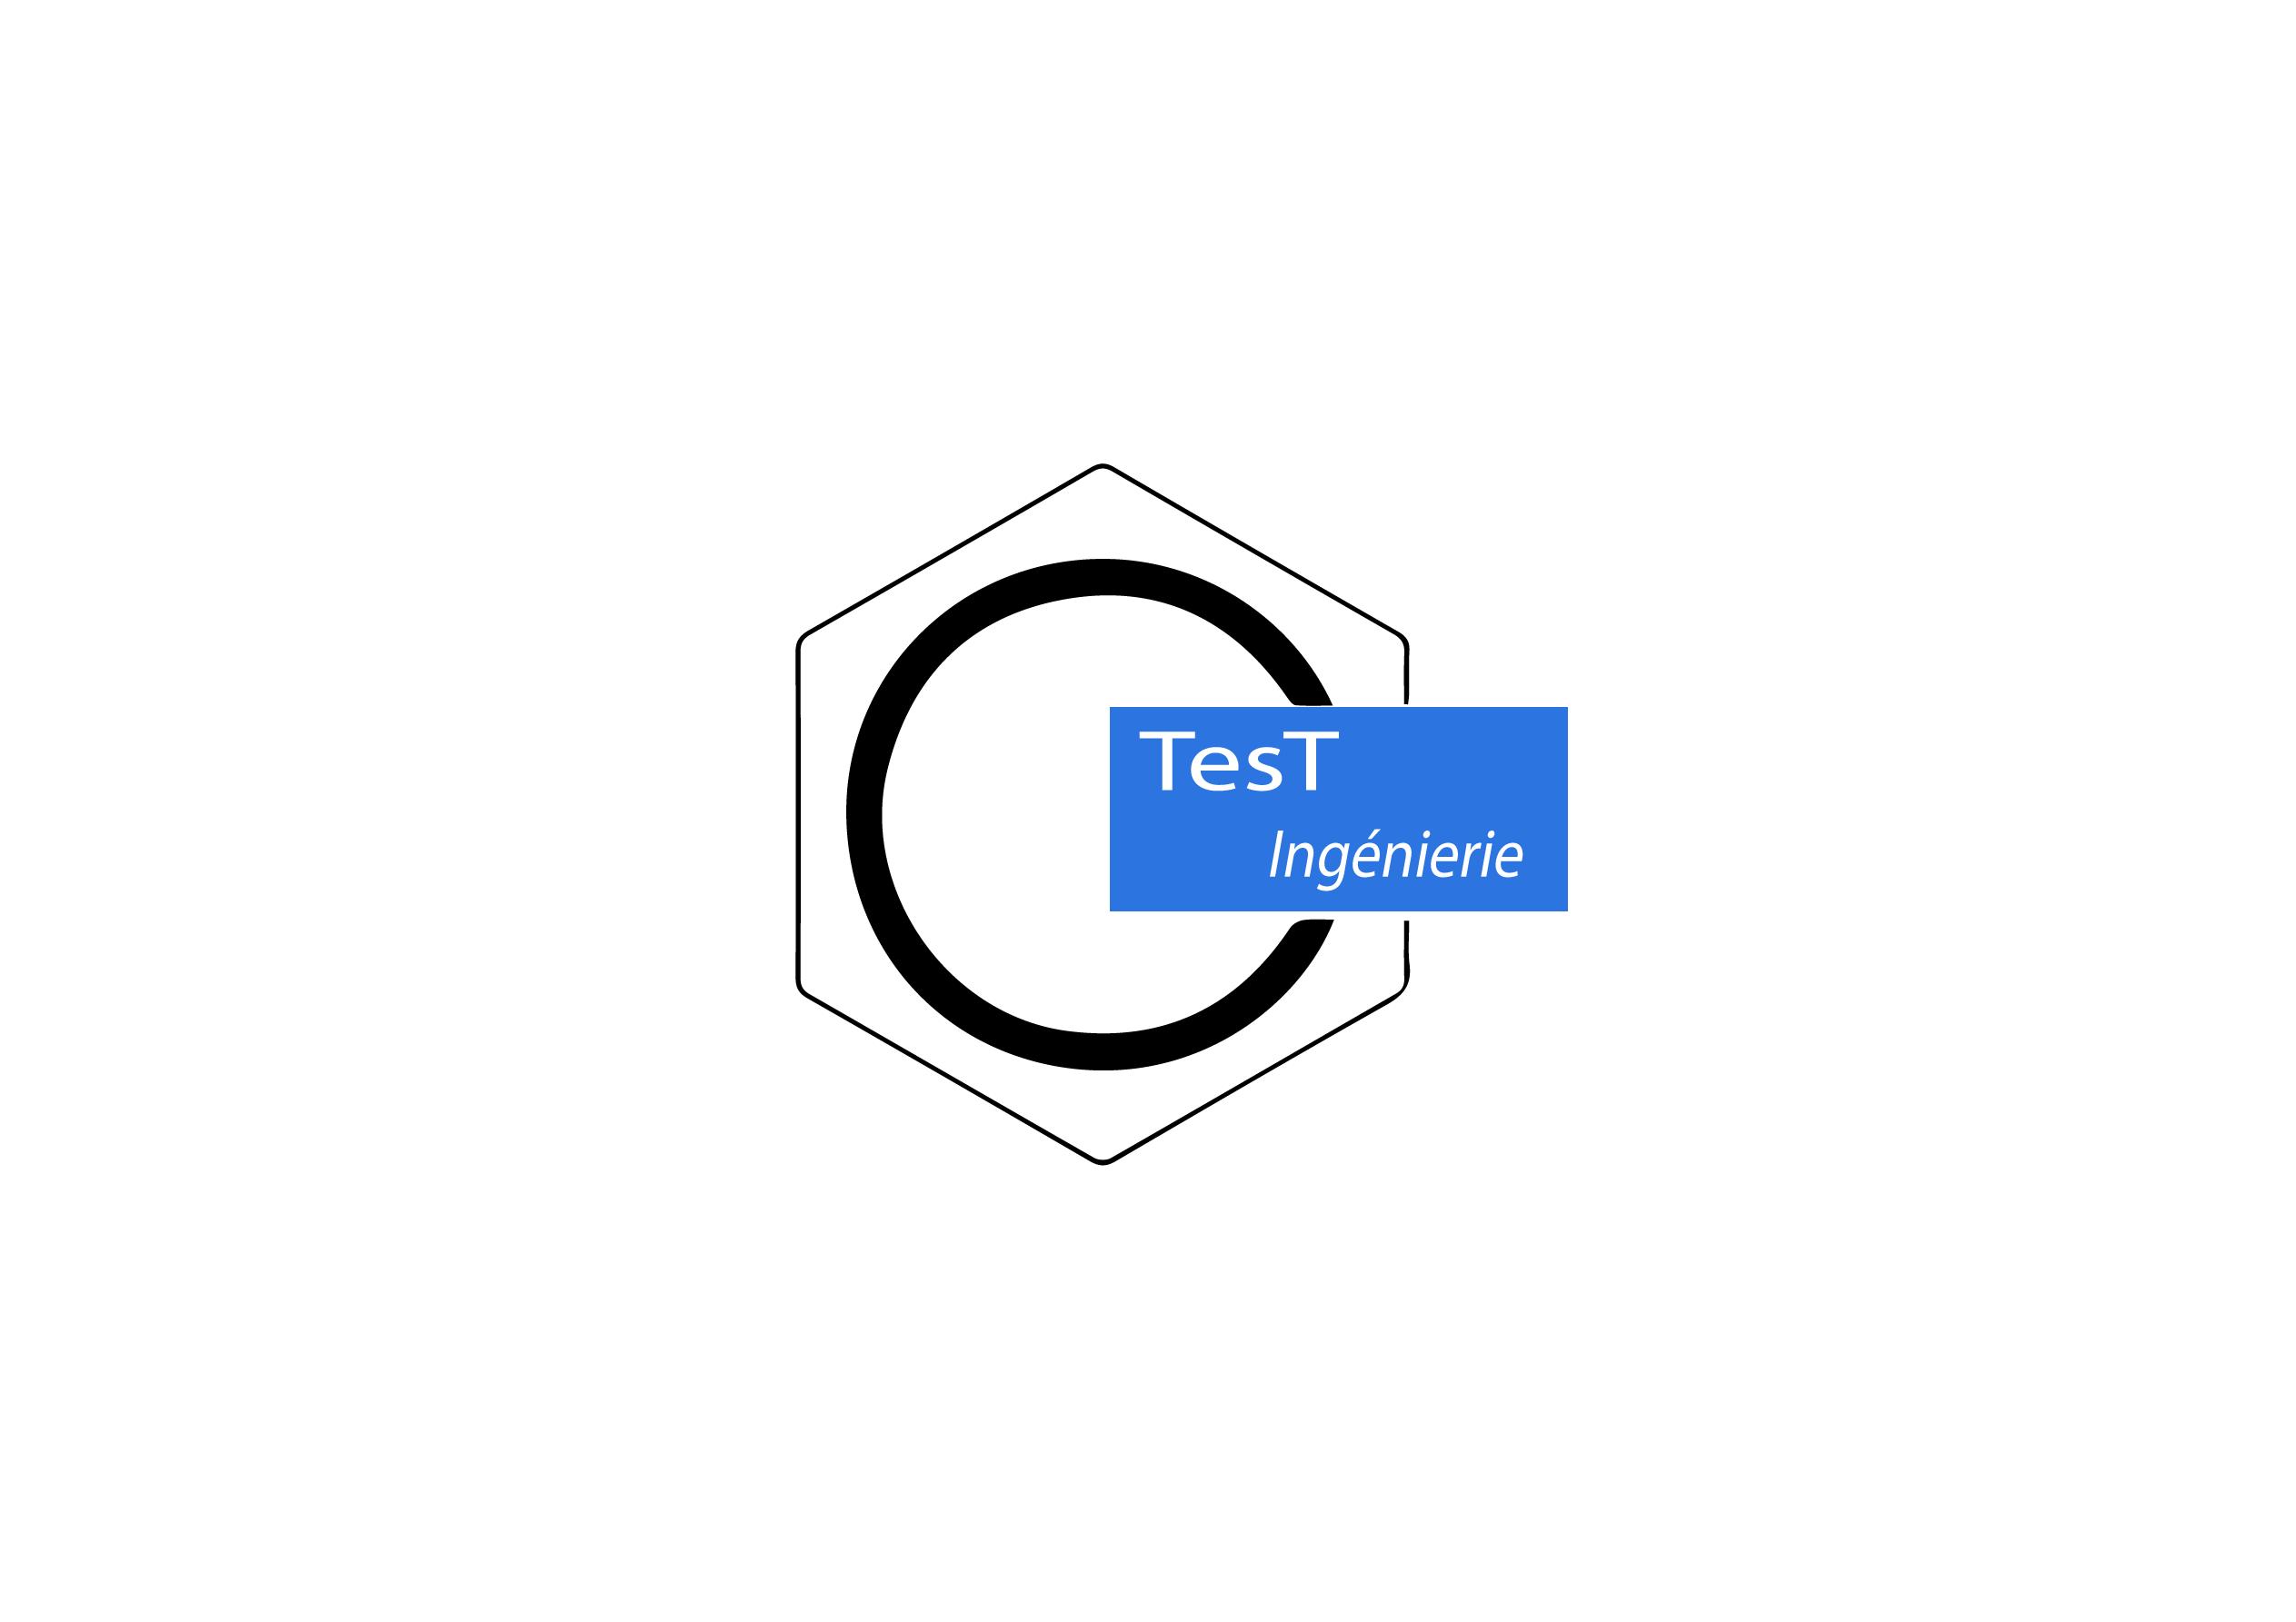 Test Ingénierie